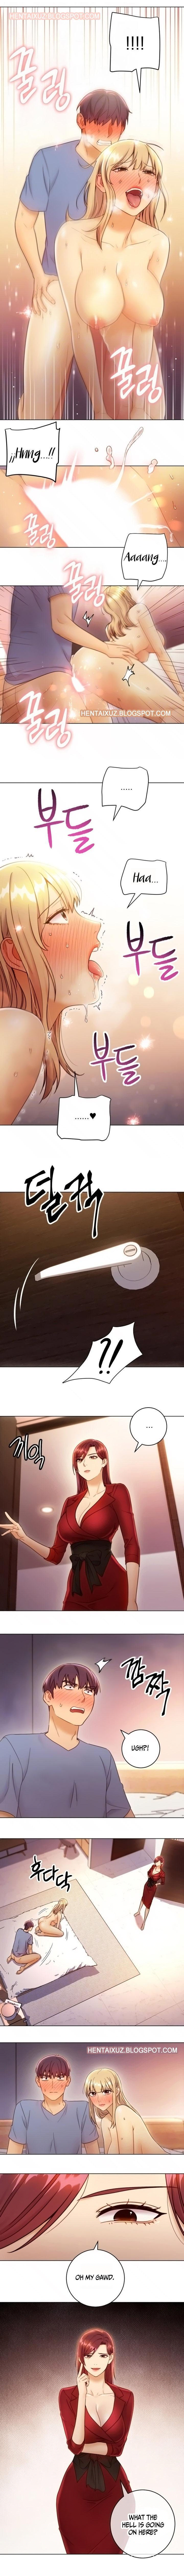 [Neck Pilllow] Stepmother Friends Ch.40/? [English] [Hentai Universe] NEW! 22/10/2020 373